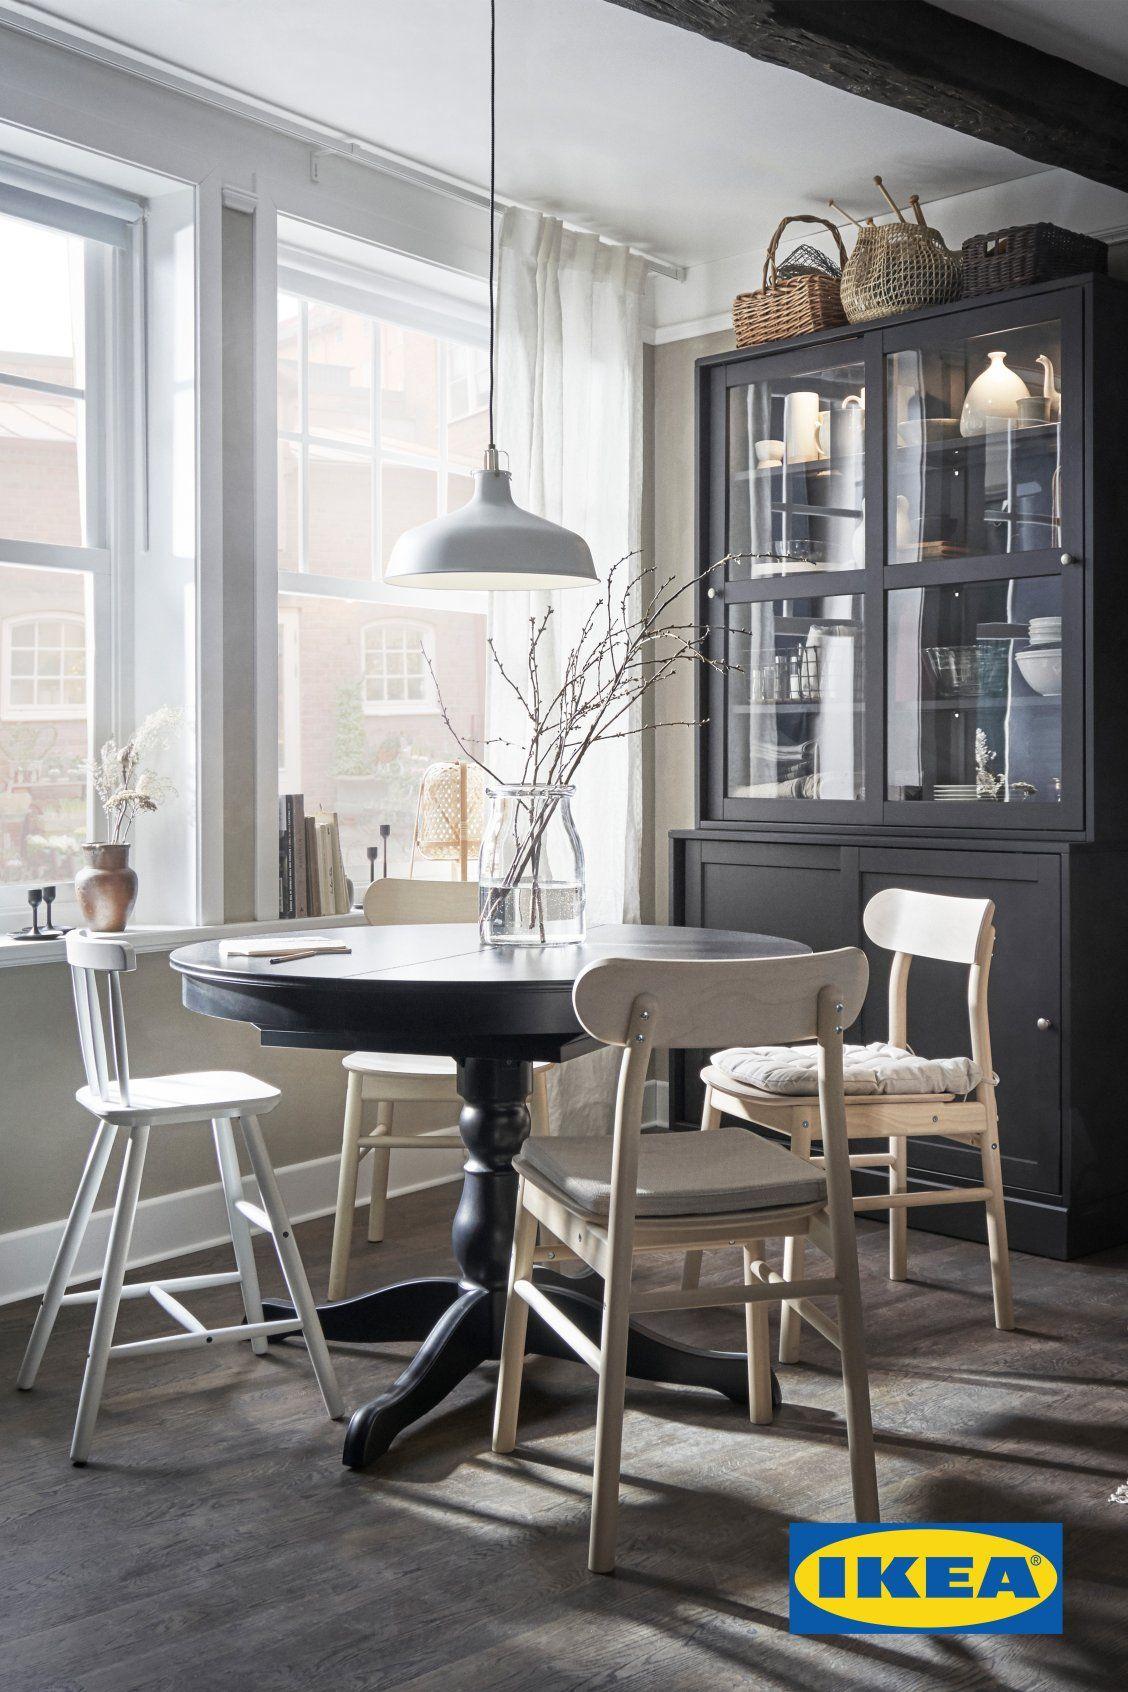 Ingatorp Extendable Table Black 431 4 61 110 155 Cm Ikea Ikea Catalog Round Dining Table Home